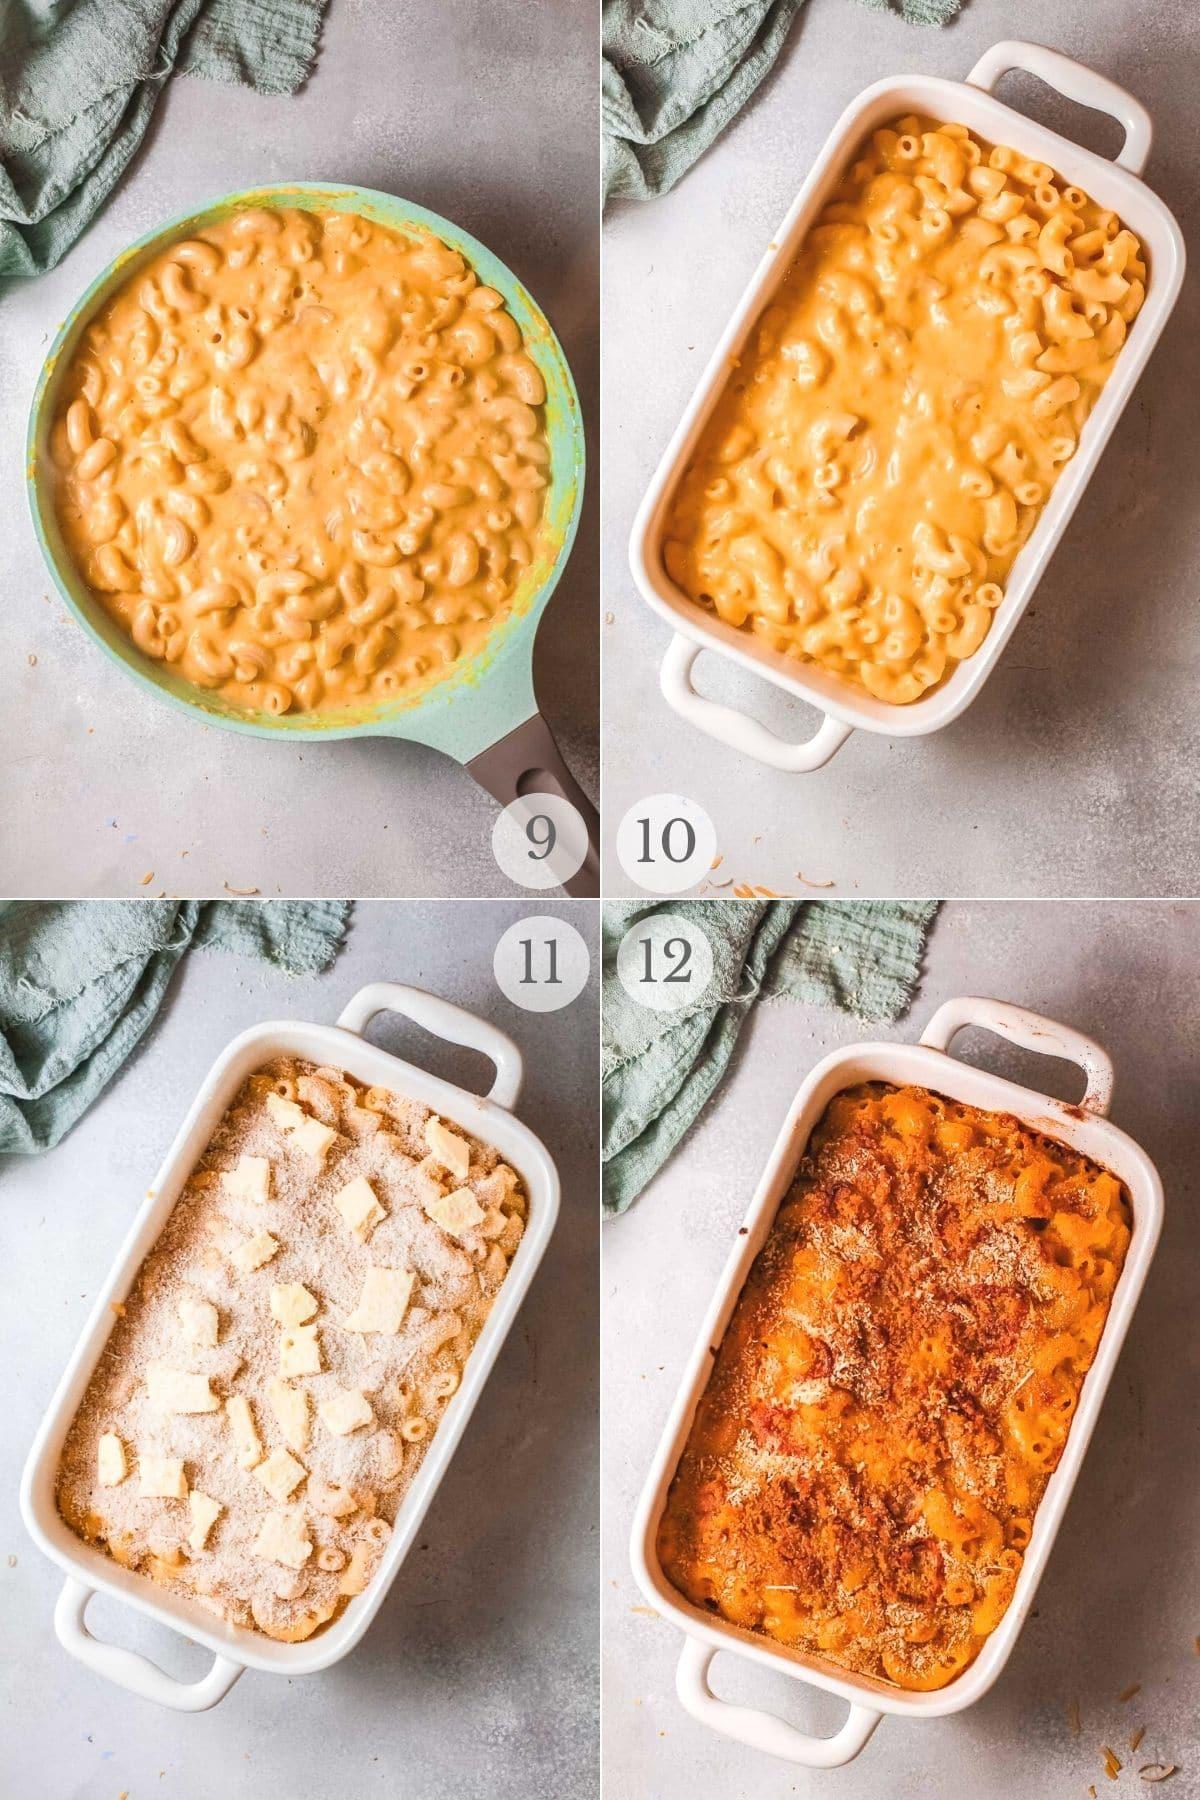 pumpkin mac and cheese recipe steps 9-12